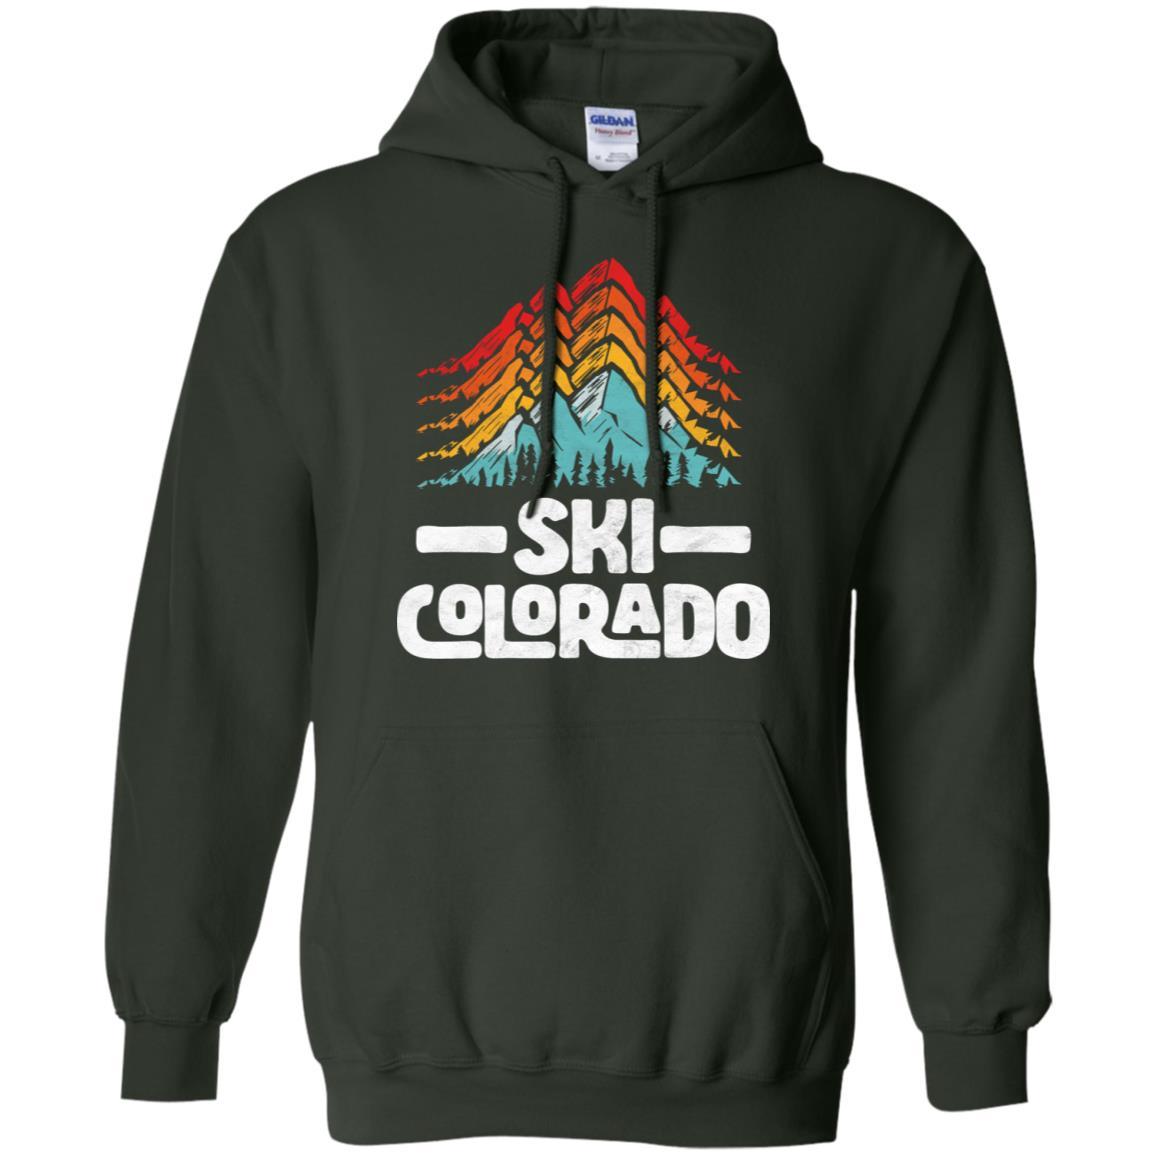 Ski Colorado Vintage 80s Mountains Pullover Hoodie